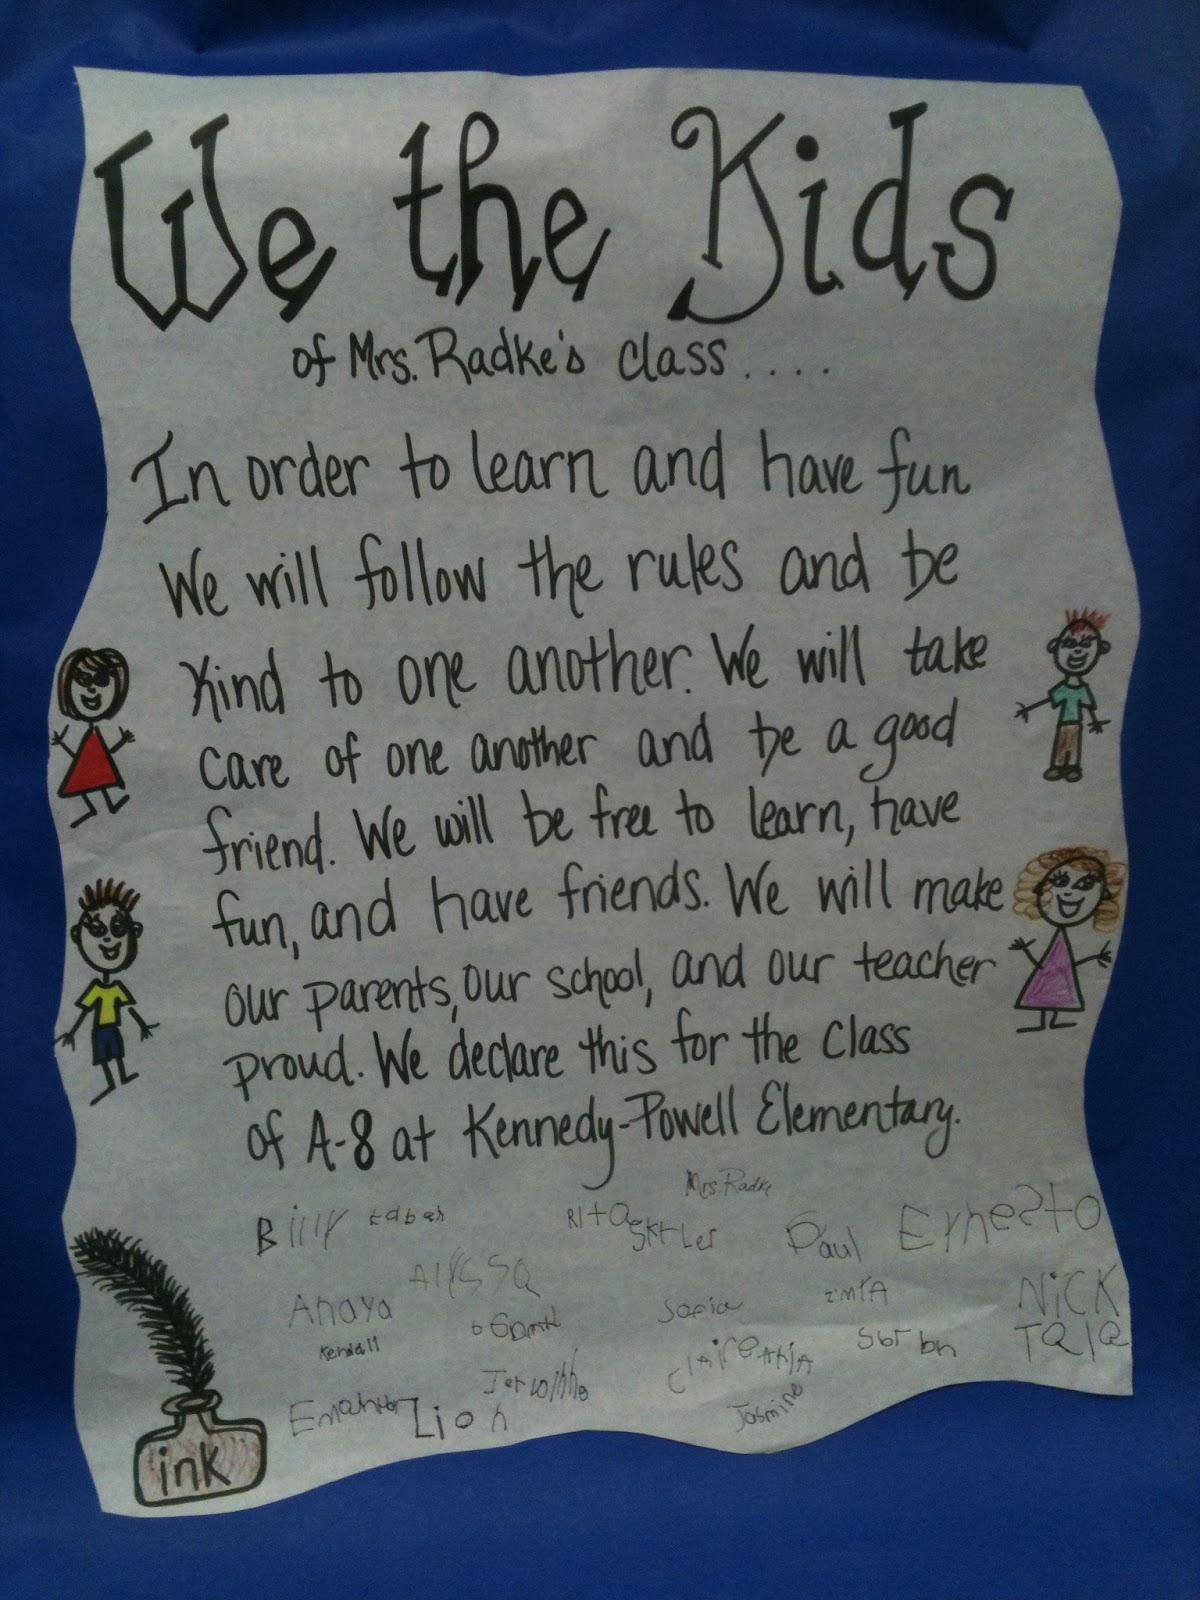 Kreative in Kinder: We the Kids!